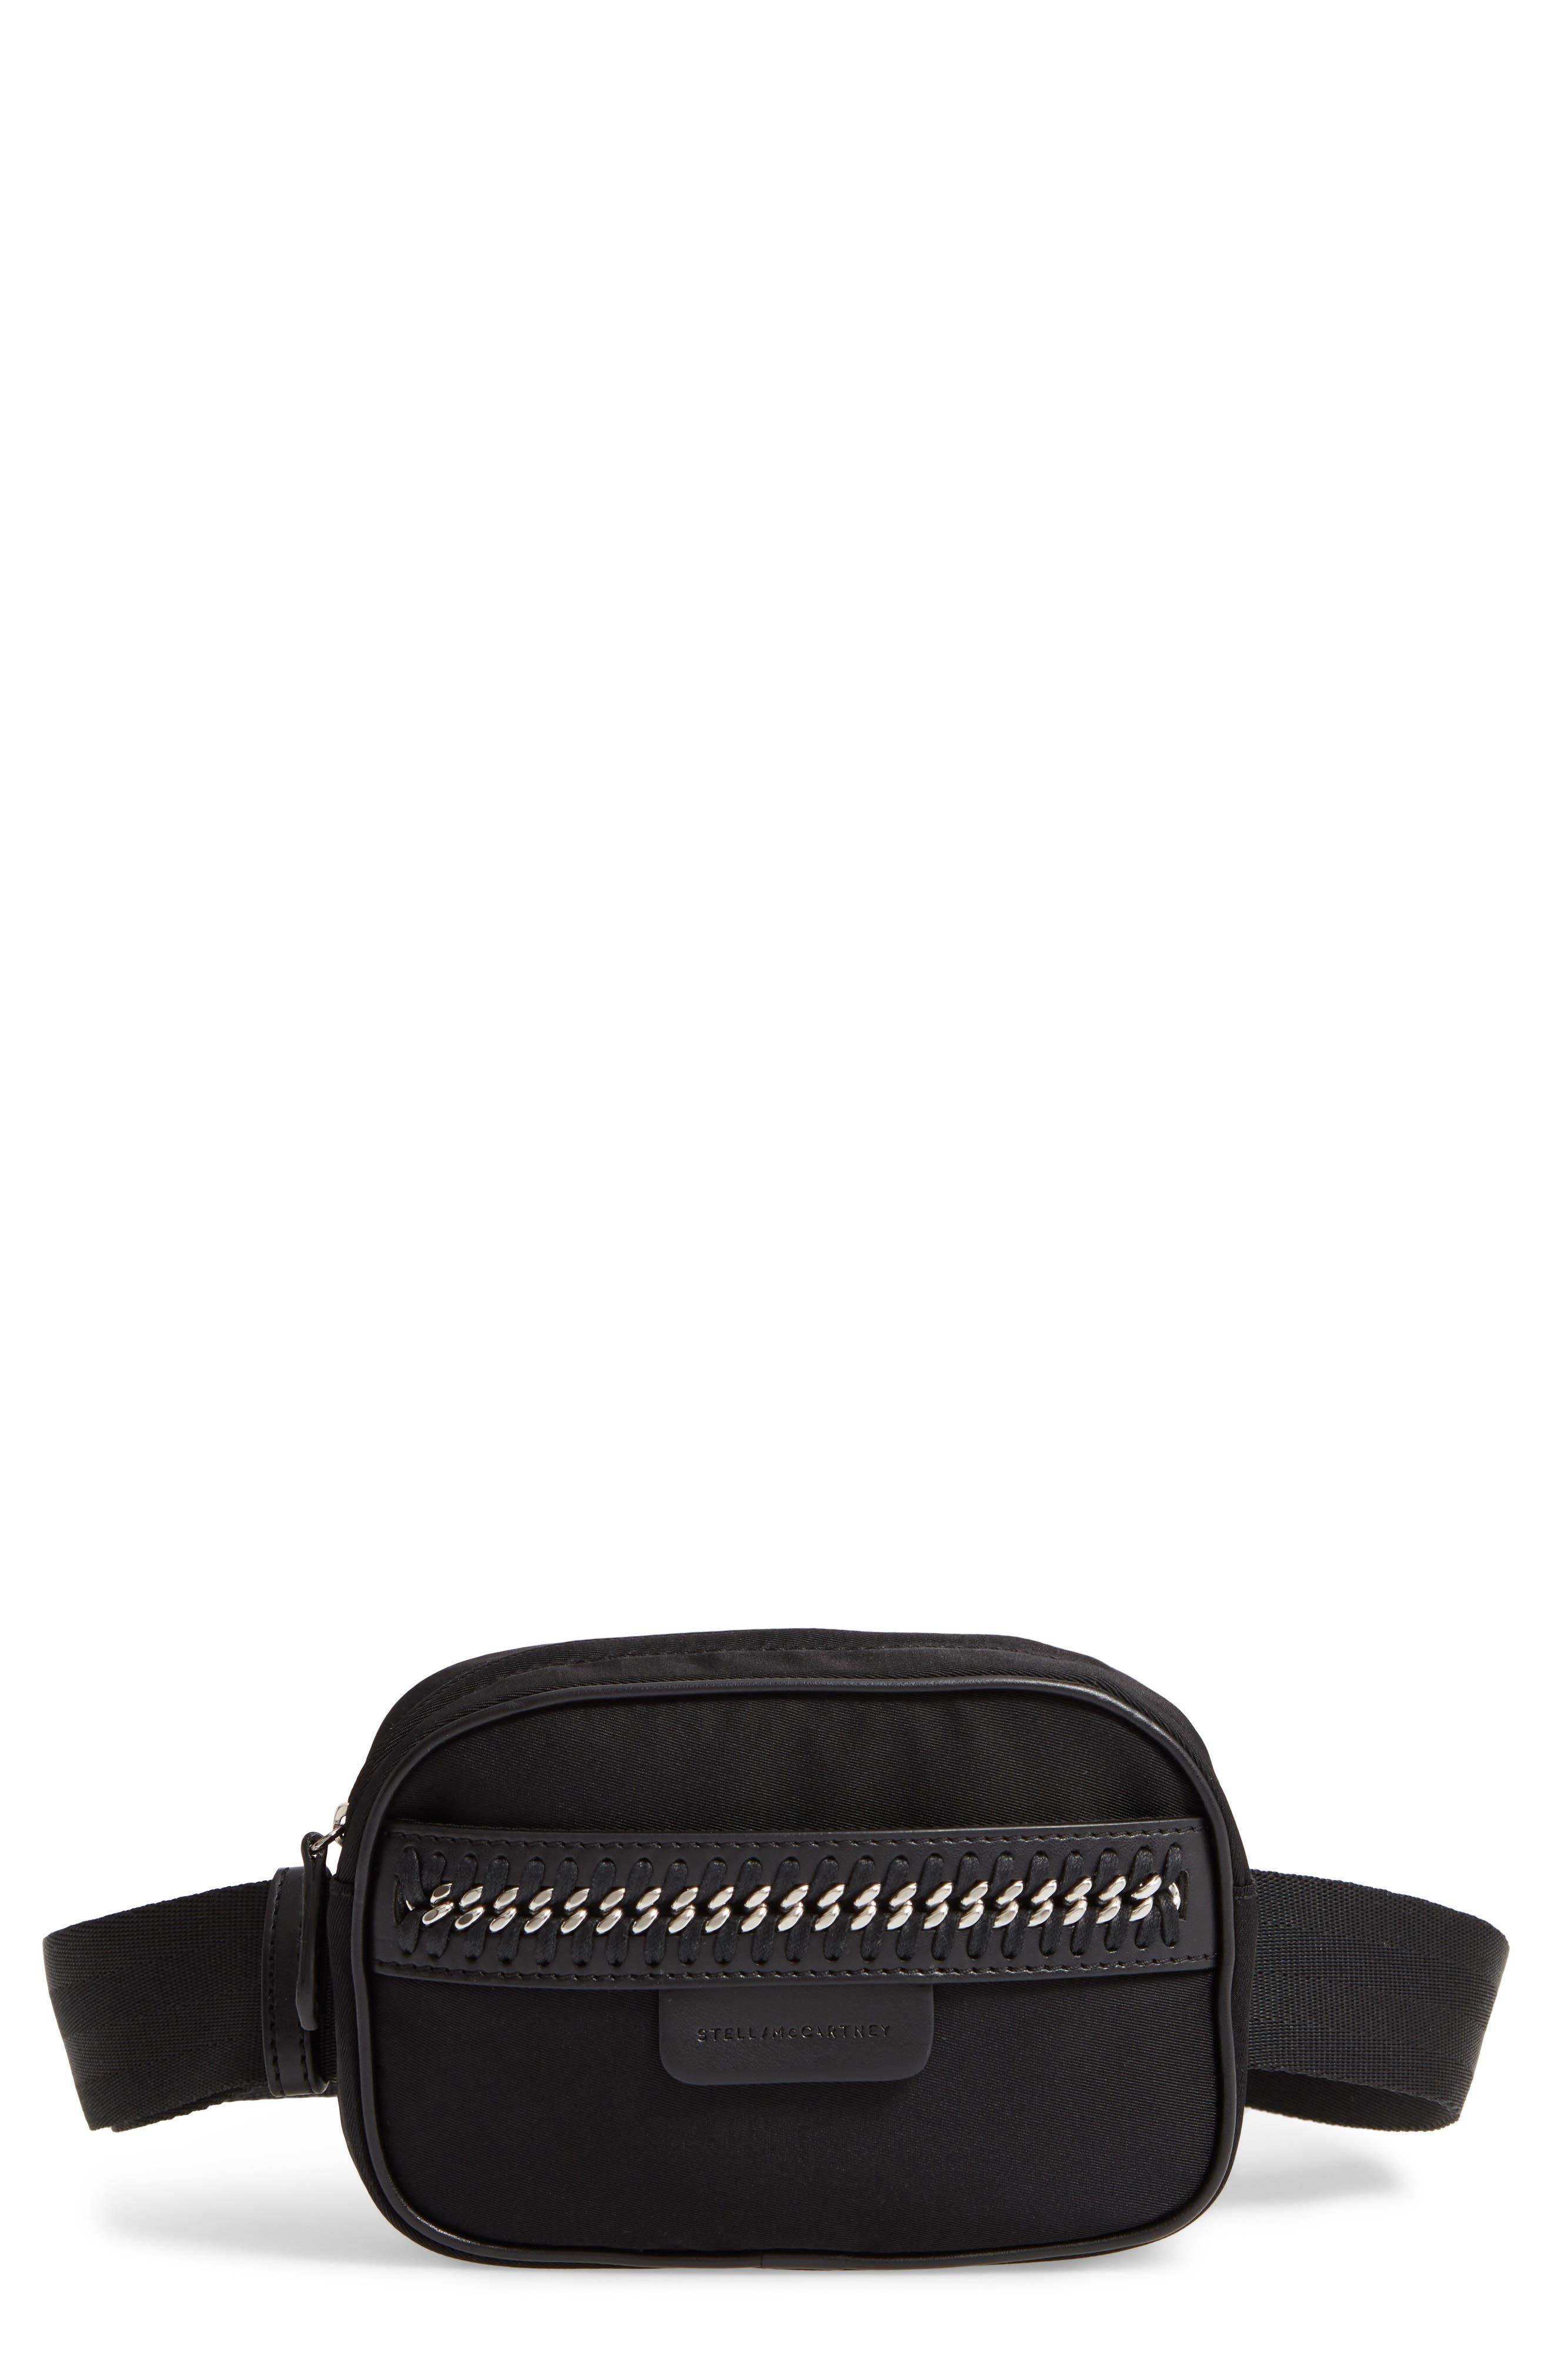 Nylon Convertible Belt Bag, Main, color, BLACK/ SILVER